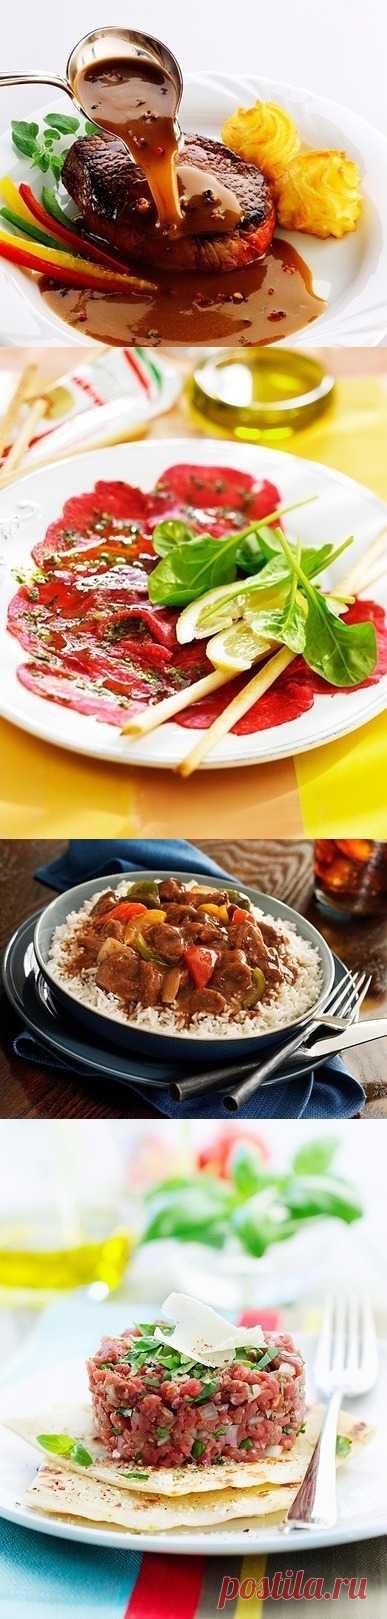 Мужское меню: готовим мясо (для получения рецепта нажмите 2 раза на картинку)